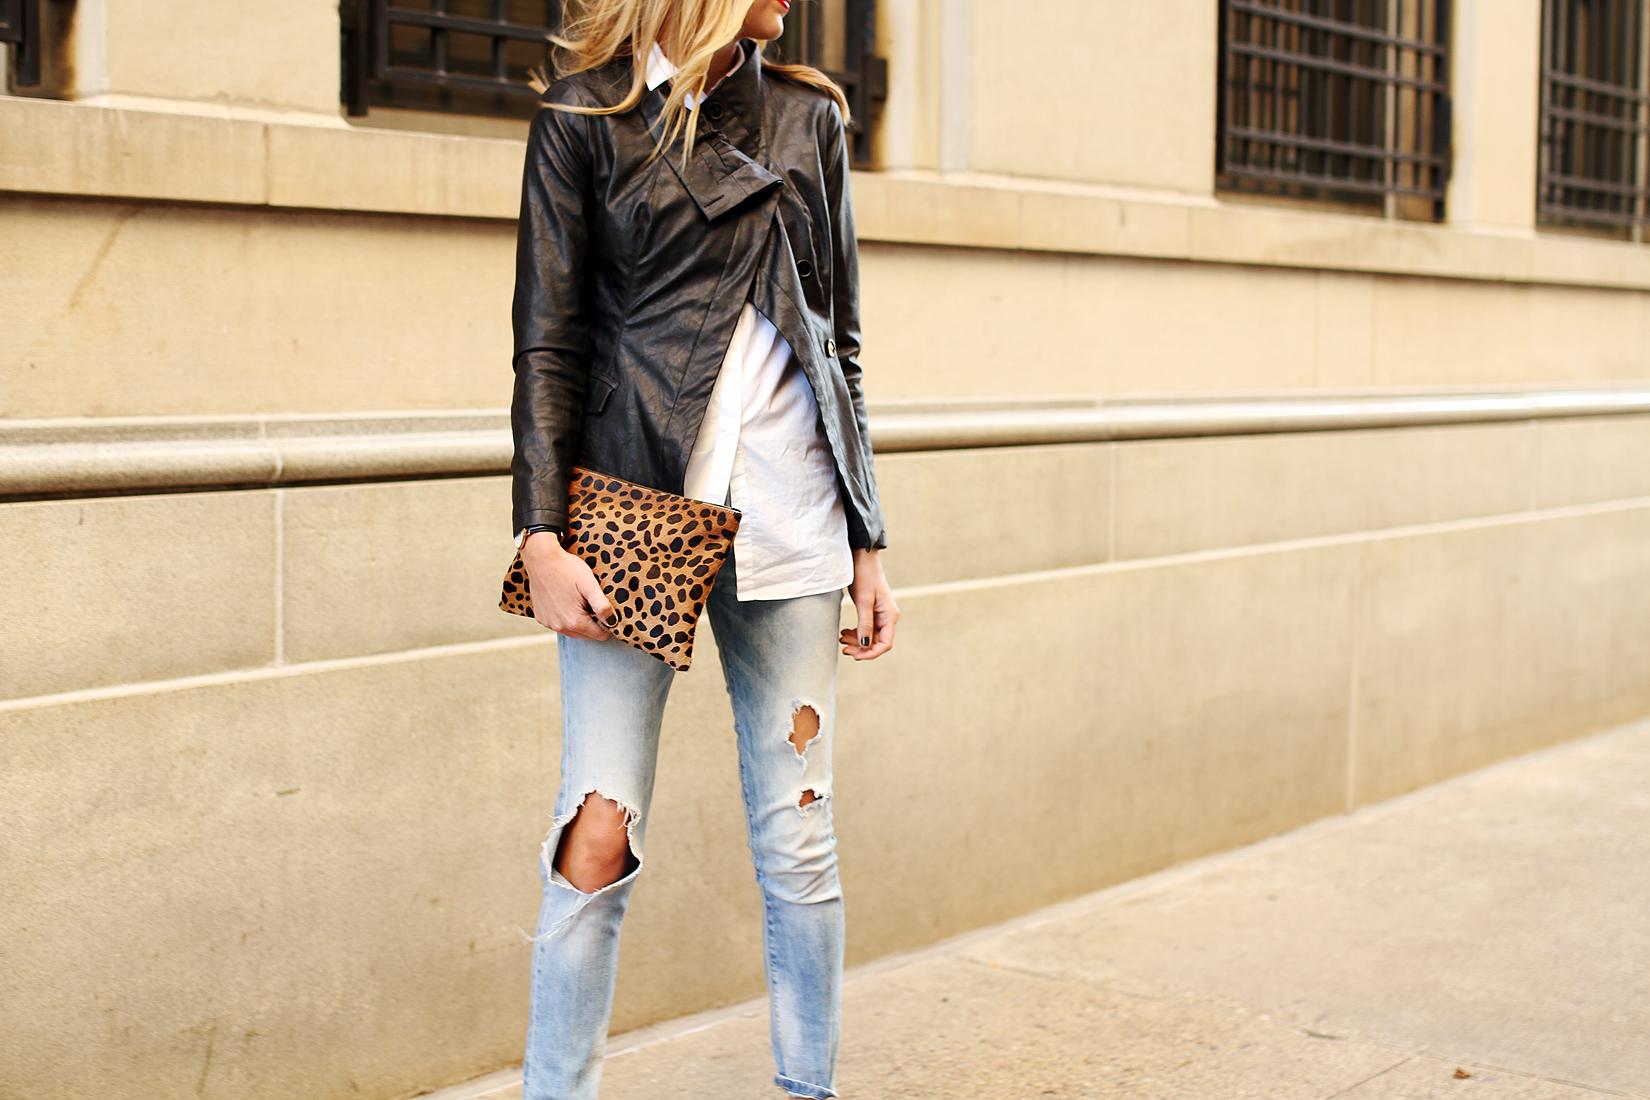 fashion-jackson-denim-ripped-skinny-jeans-black-faux-leather-jacket-leopard-clutch